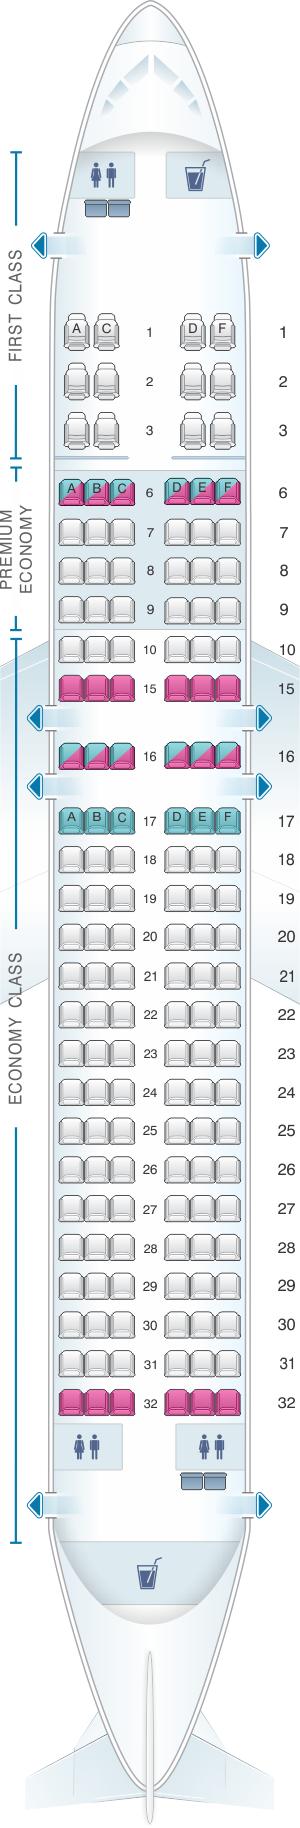 Seat map for Alaska Airlines - Horizon Air Airbus A320 214 retrofit